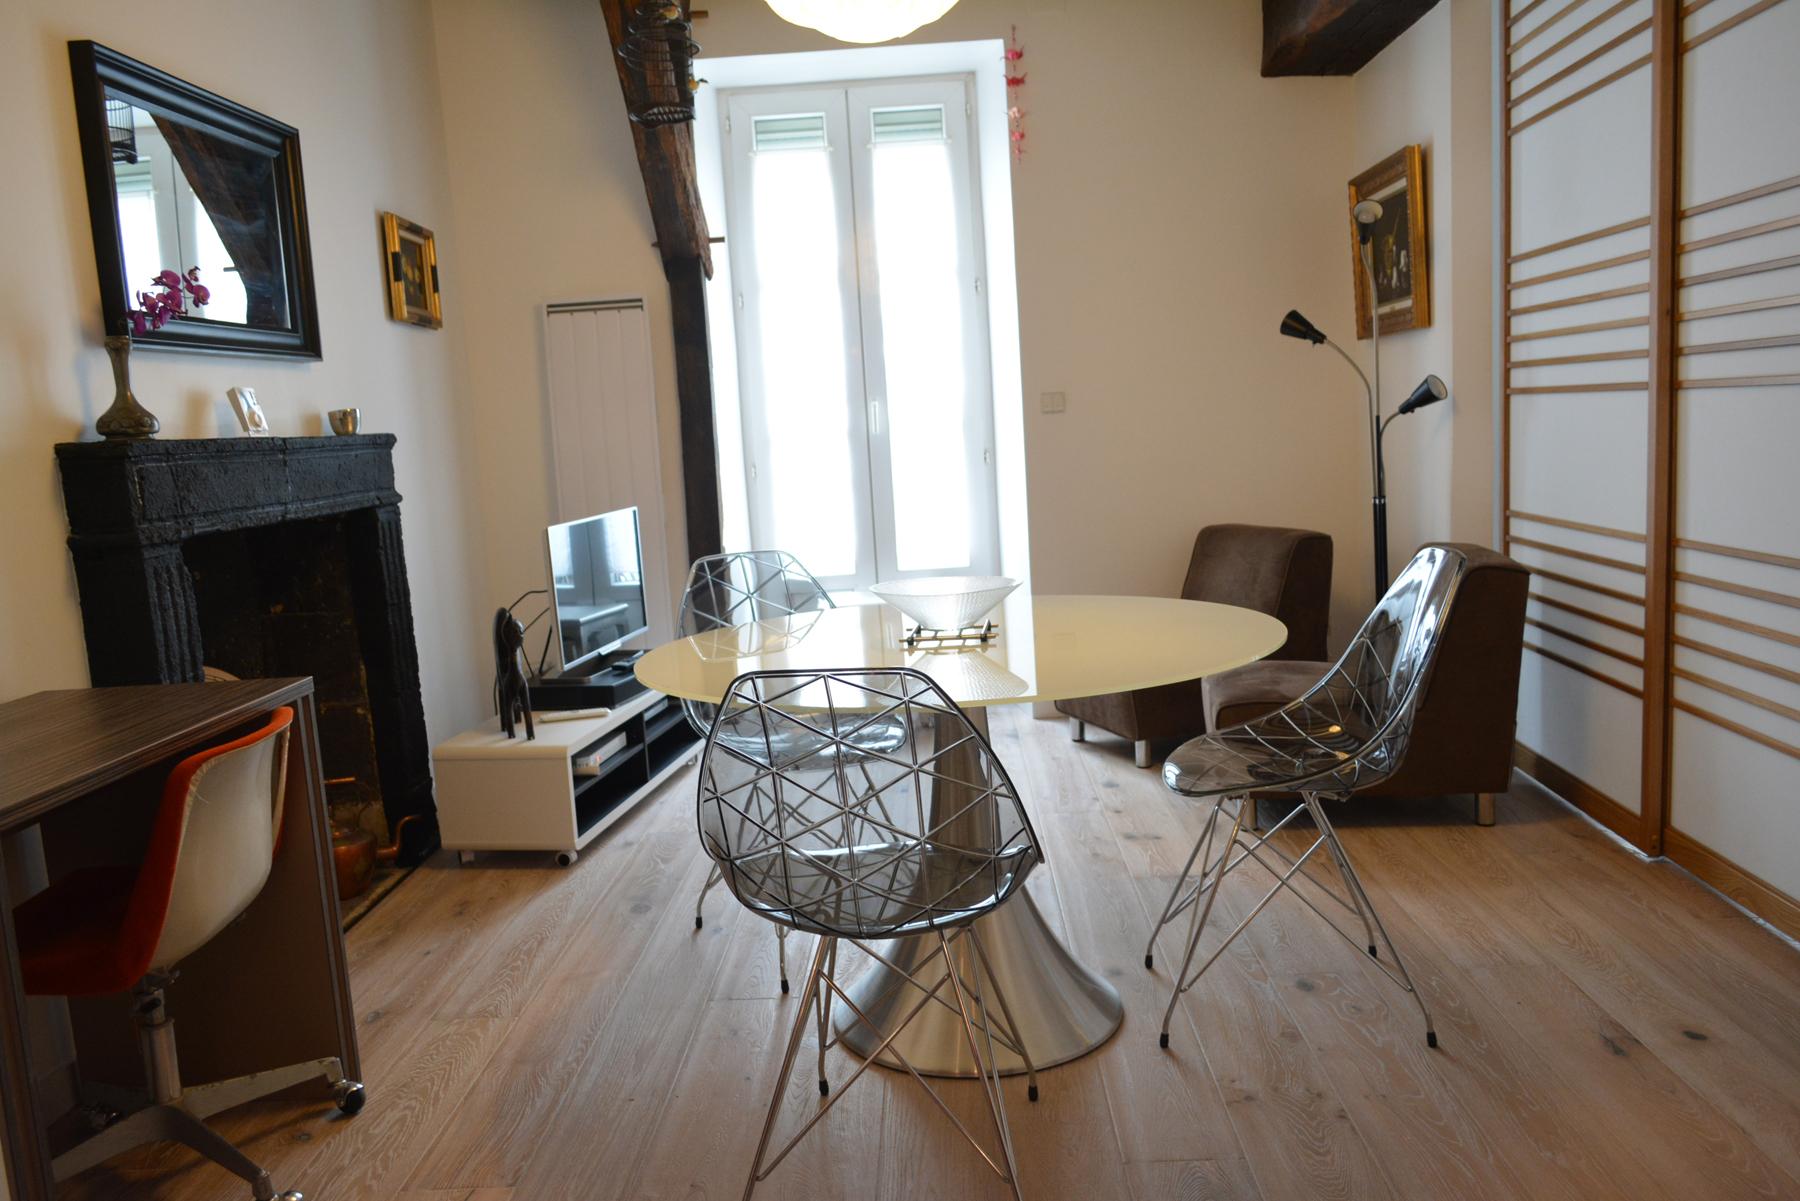 location maison ou appartement. Black Bedroom Furniture Sets. Home Design Ideas